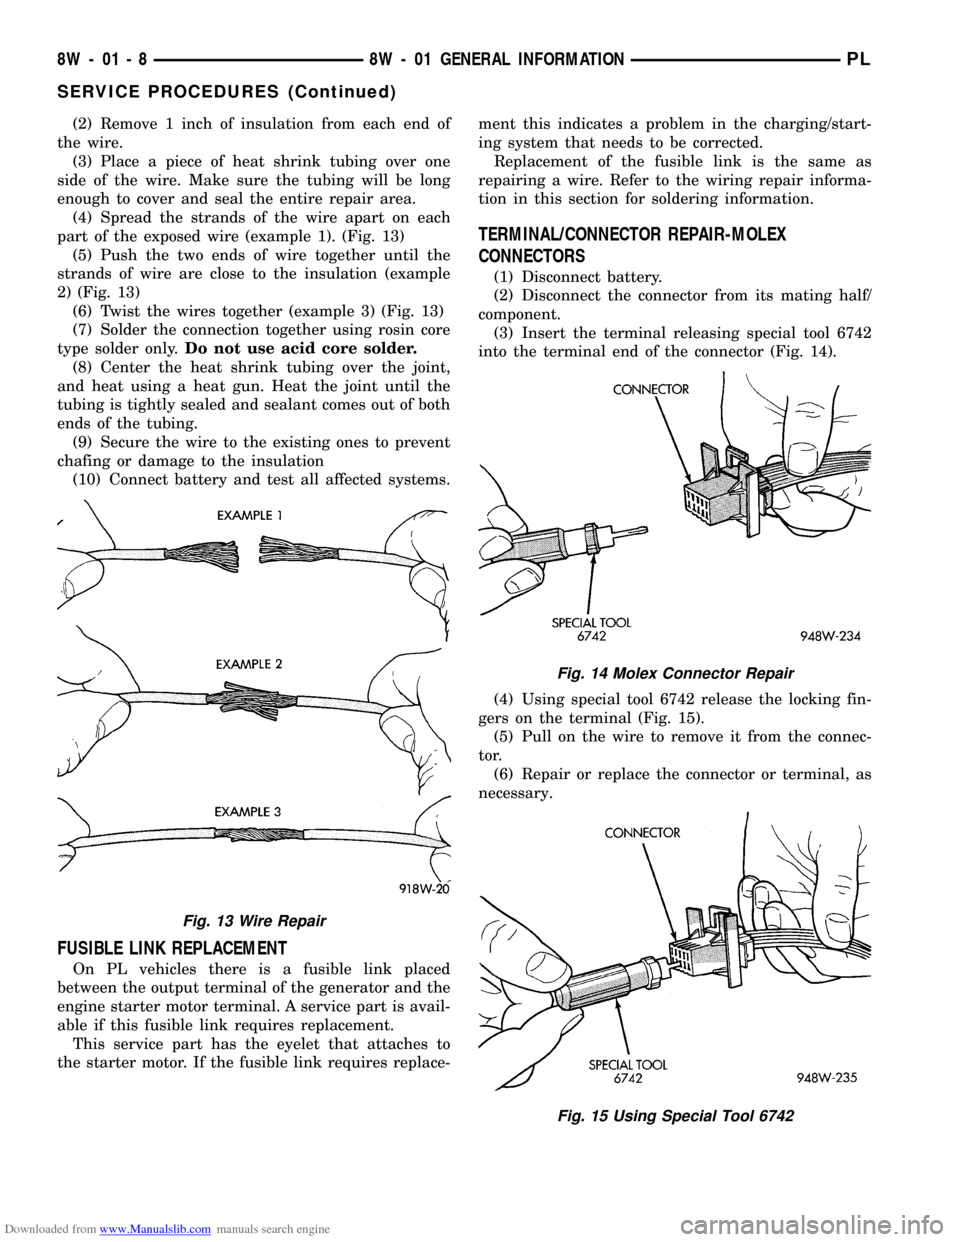 1997 dodge neon starter wiring diagram gold silver copper phase 1 g diagrams workshop manual